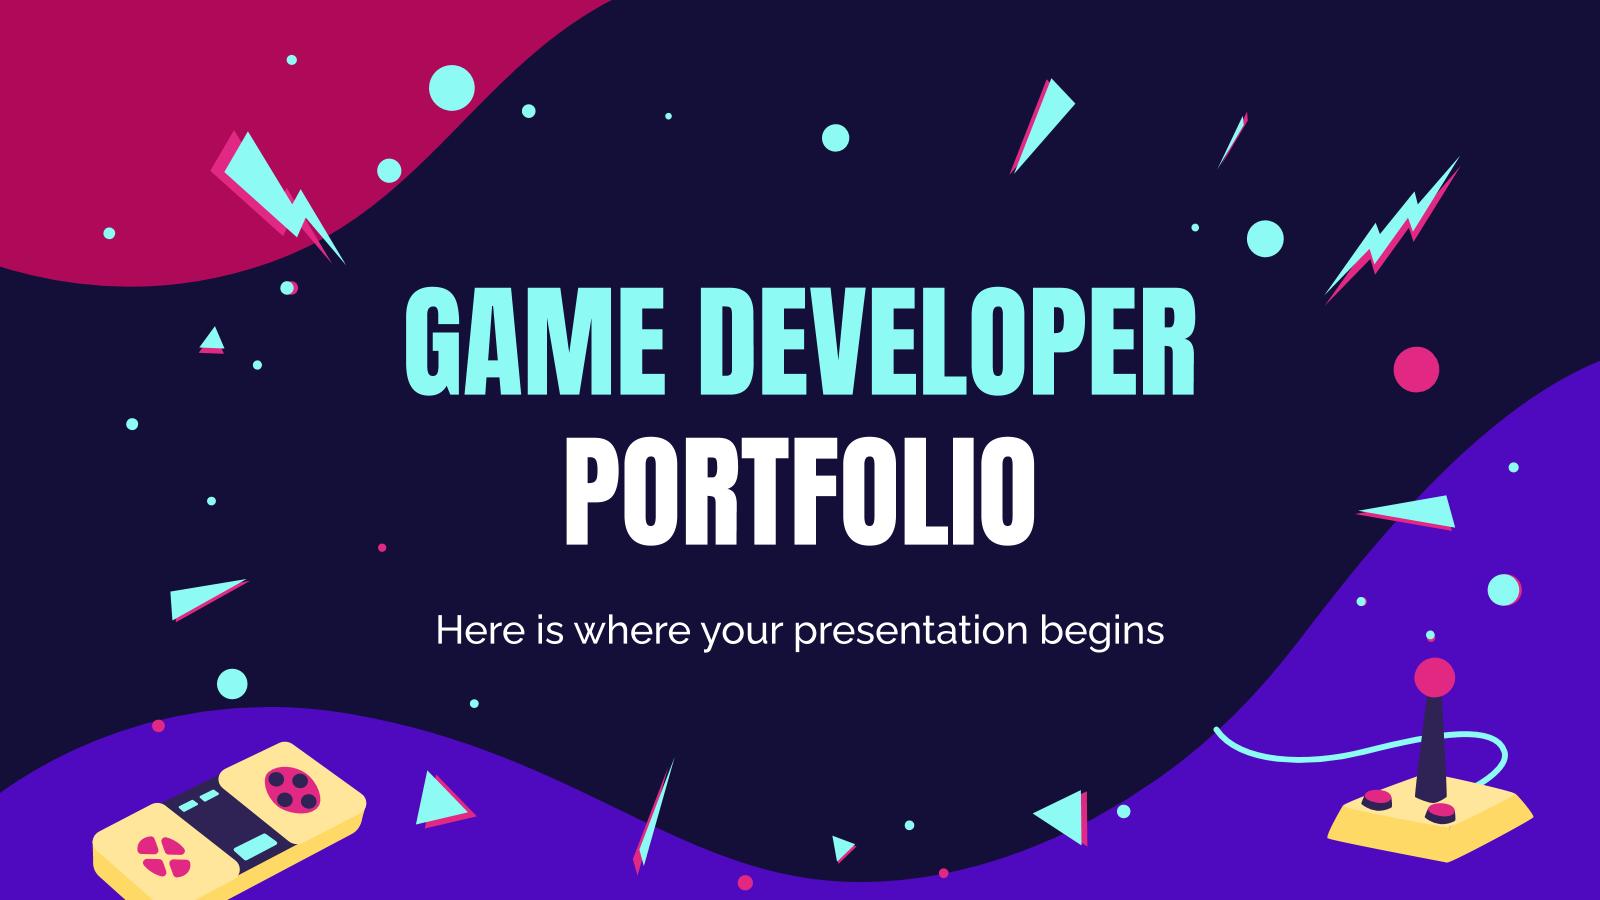 Game Developer Portfolio presentation template